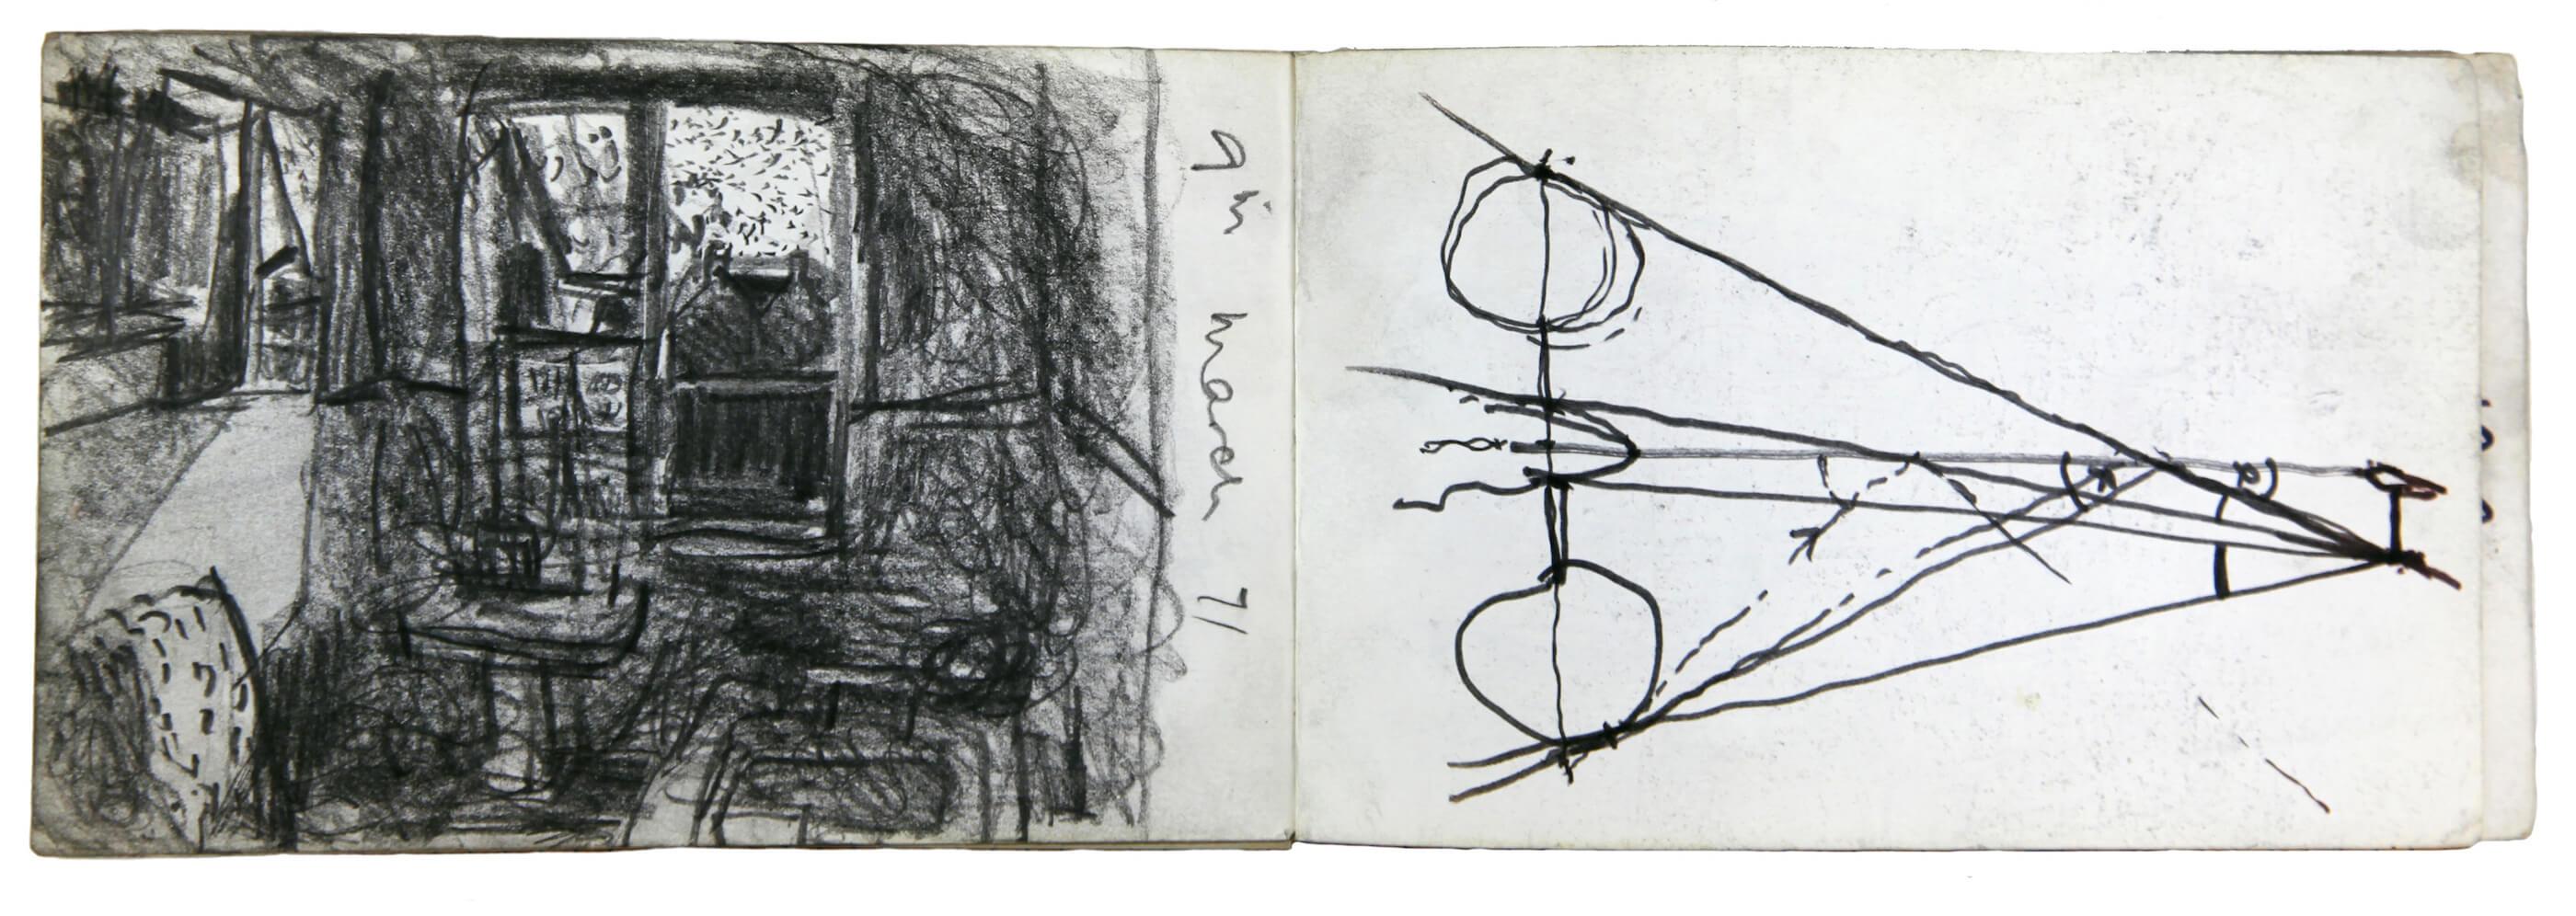 Sargy Mann, Lemmons Bathroom, and two-eyed vision study, sketchbook (Sargy Mann estate)